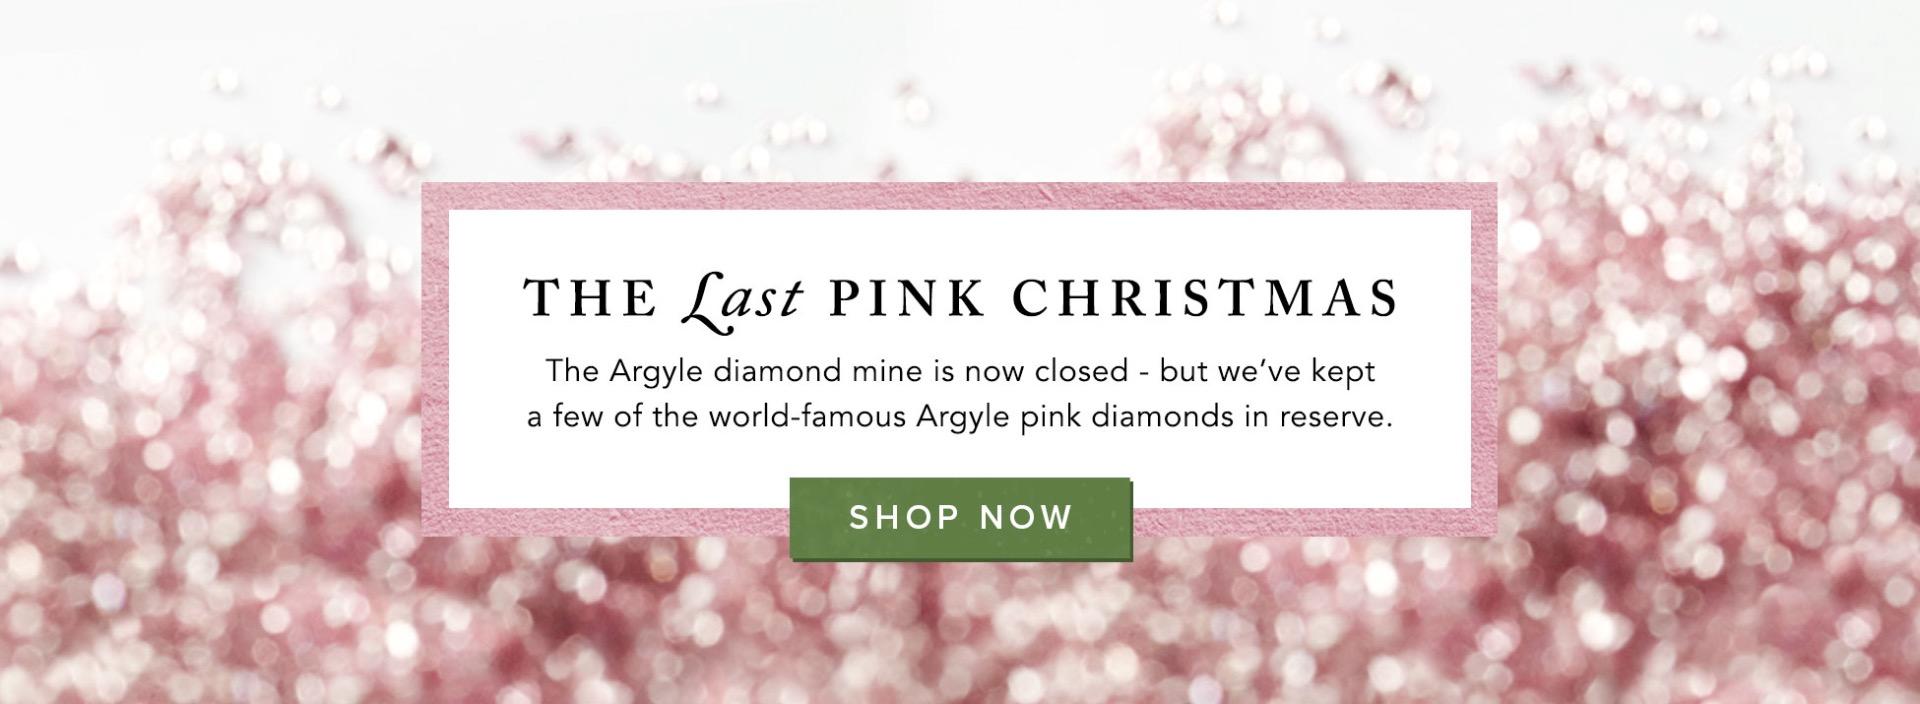 Argyle pink diamonds | The last pink Christmas